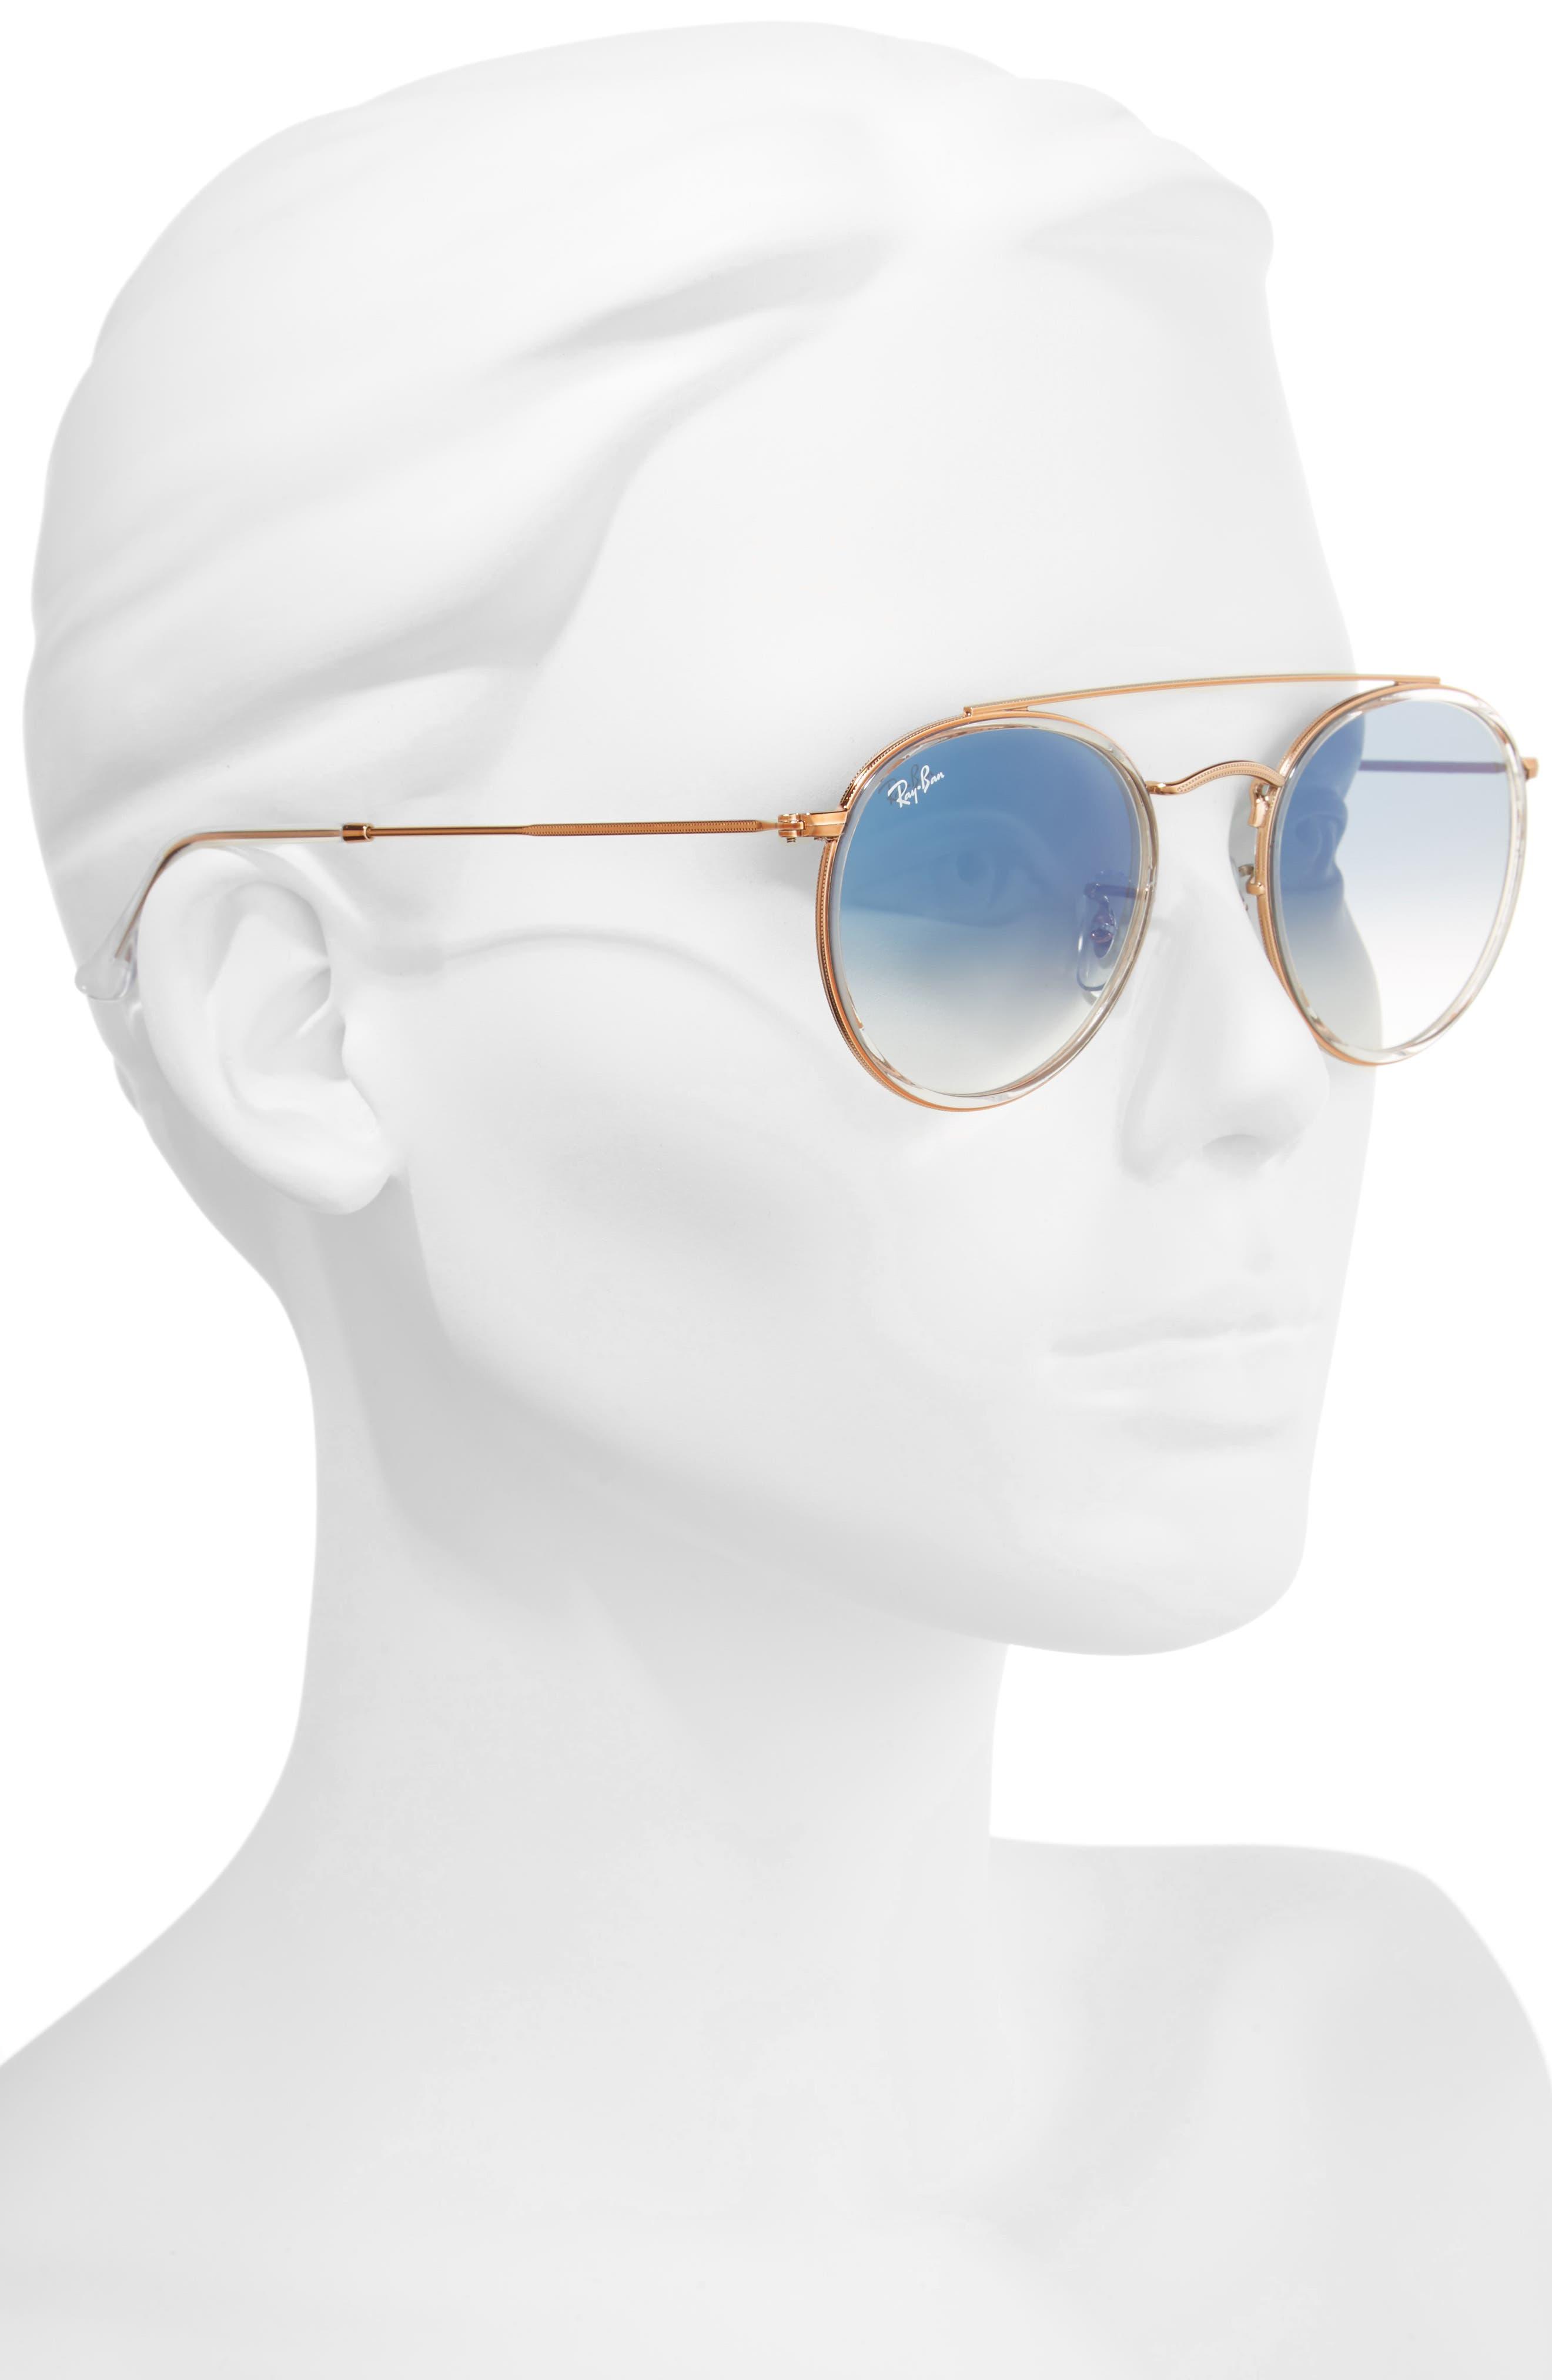 51mm Aviator Gradient Lens Sunglasses,                             Alternate thumbnail 7, color,